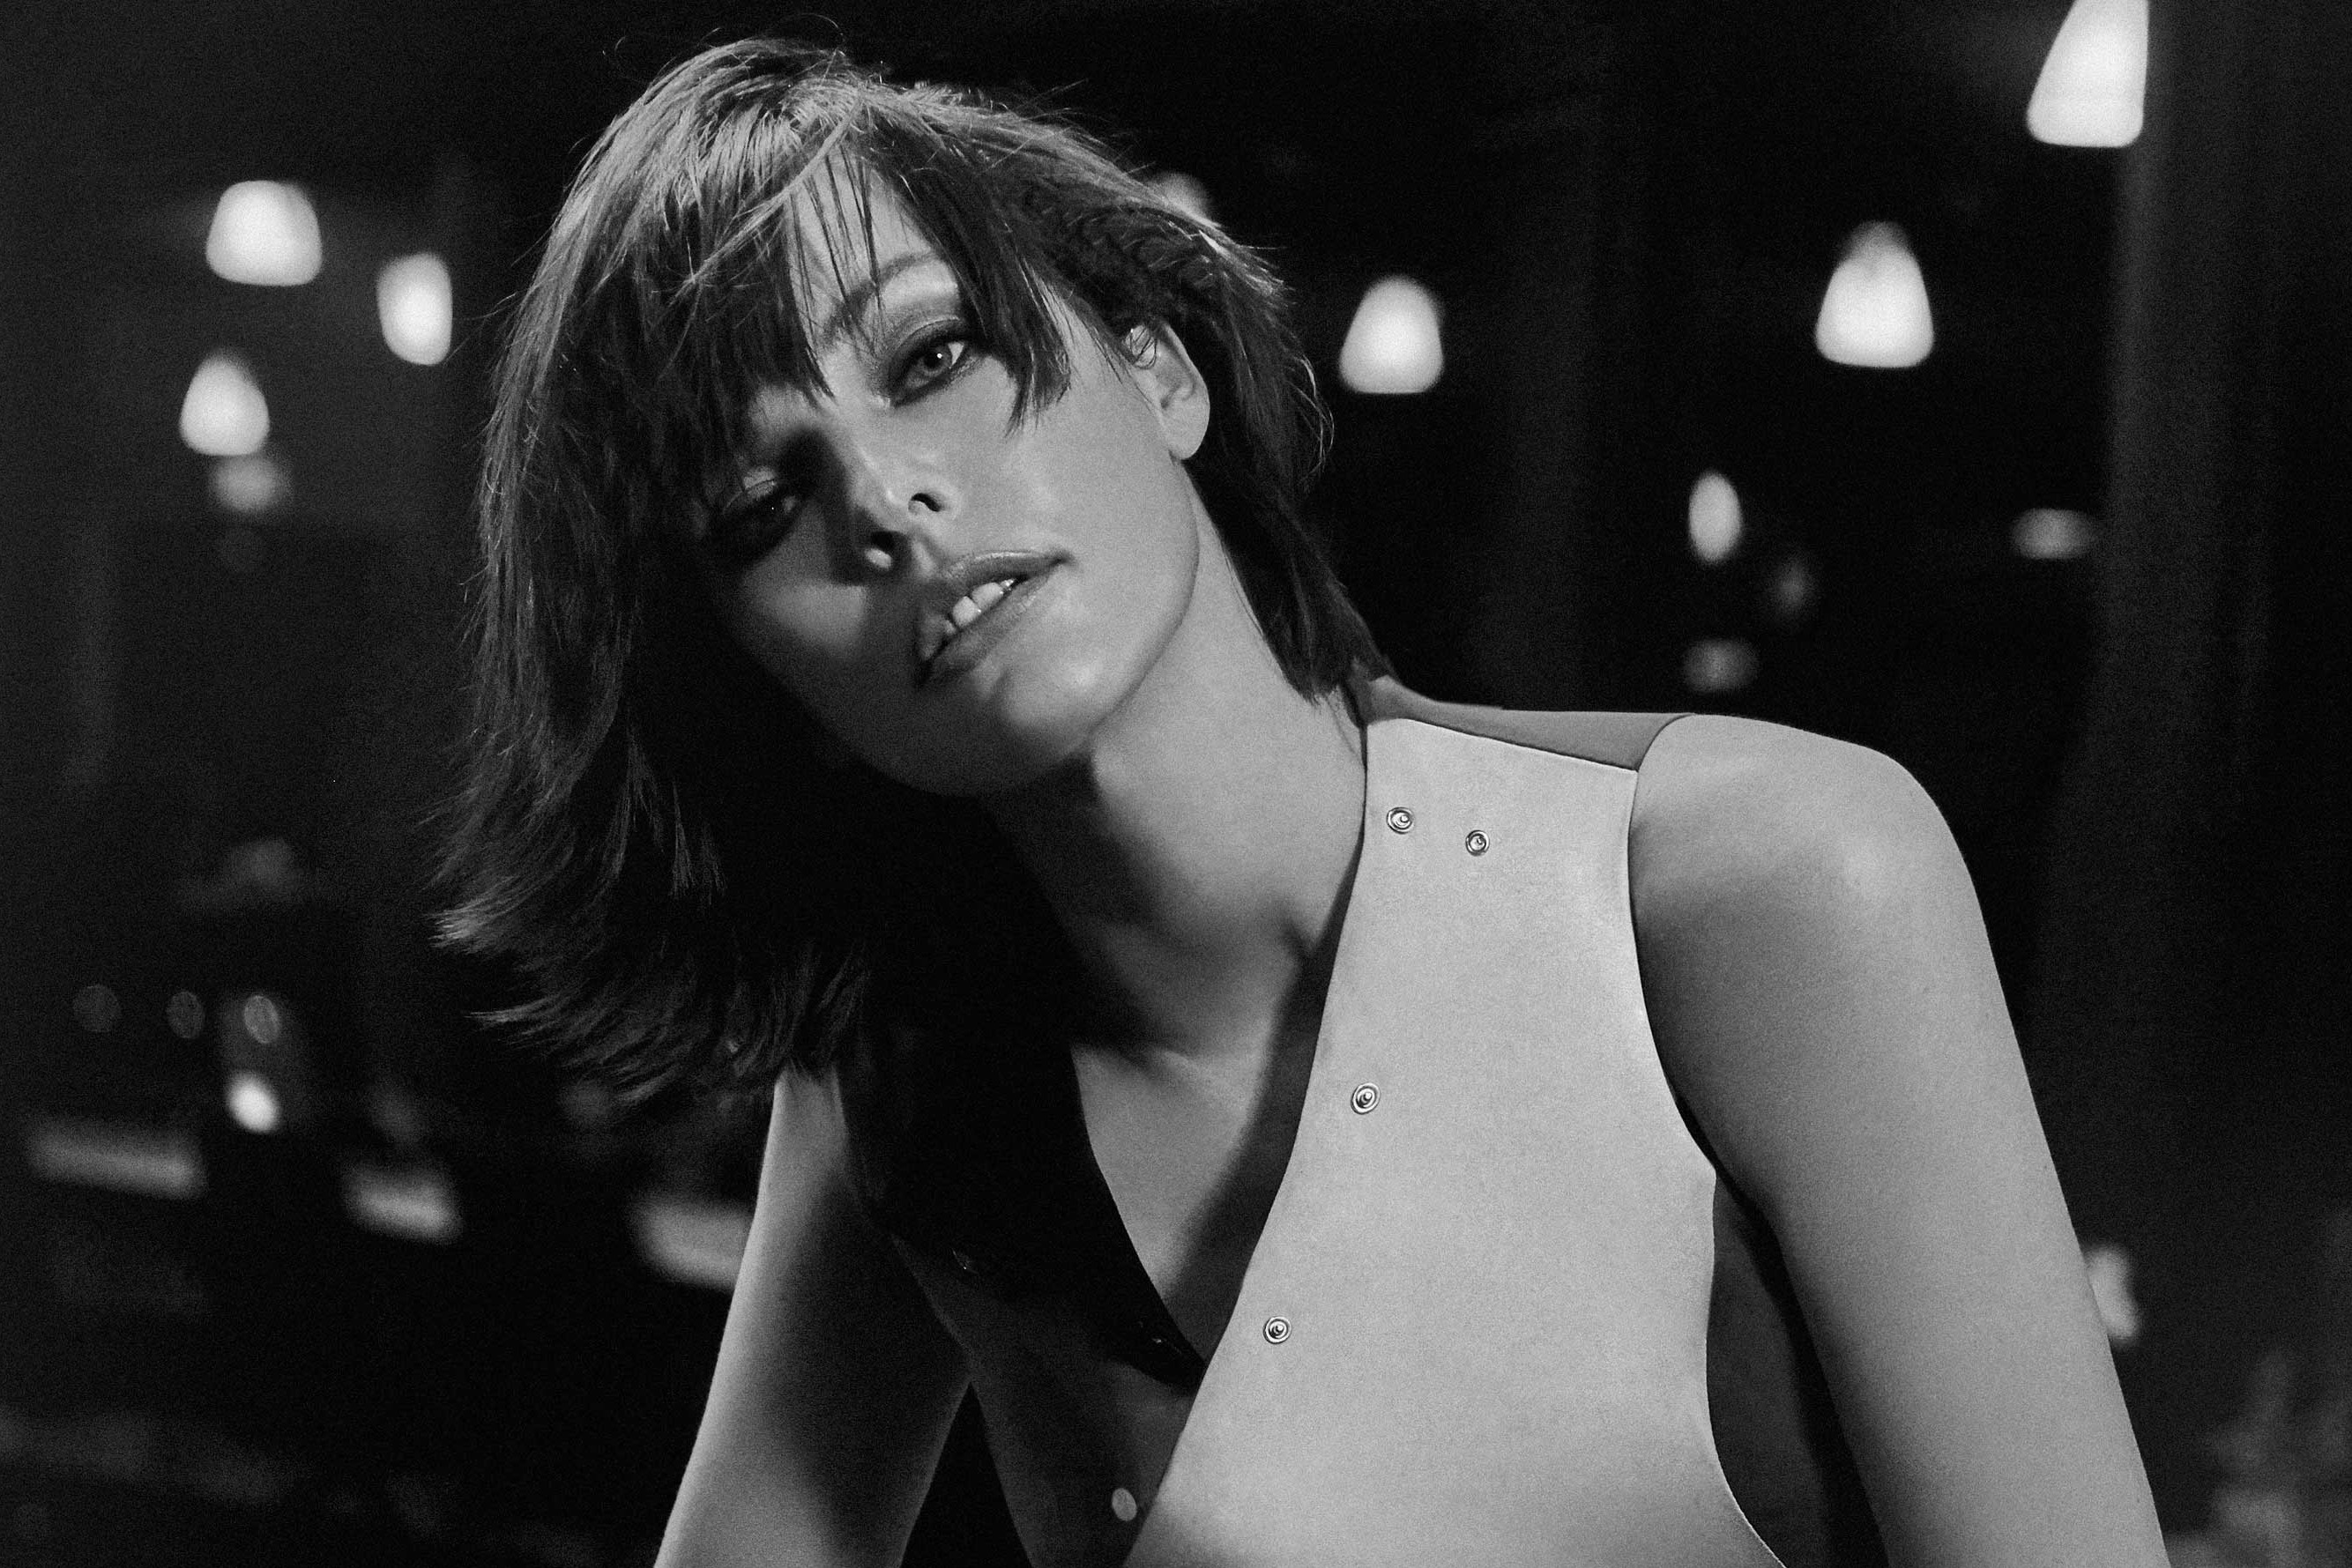 Milla Jovovich talks Politics, Child Actors and Shopping